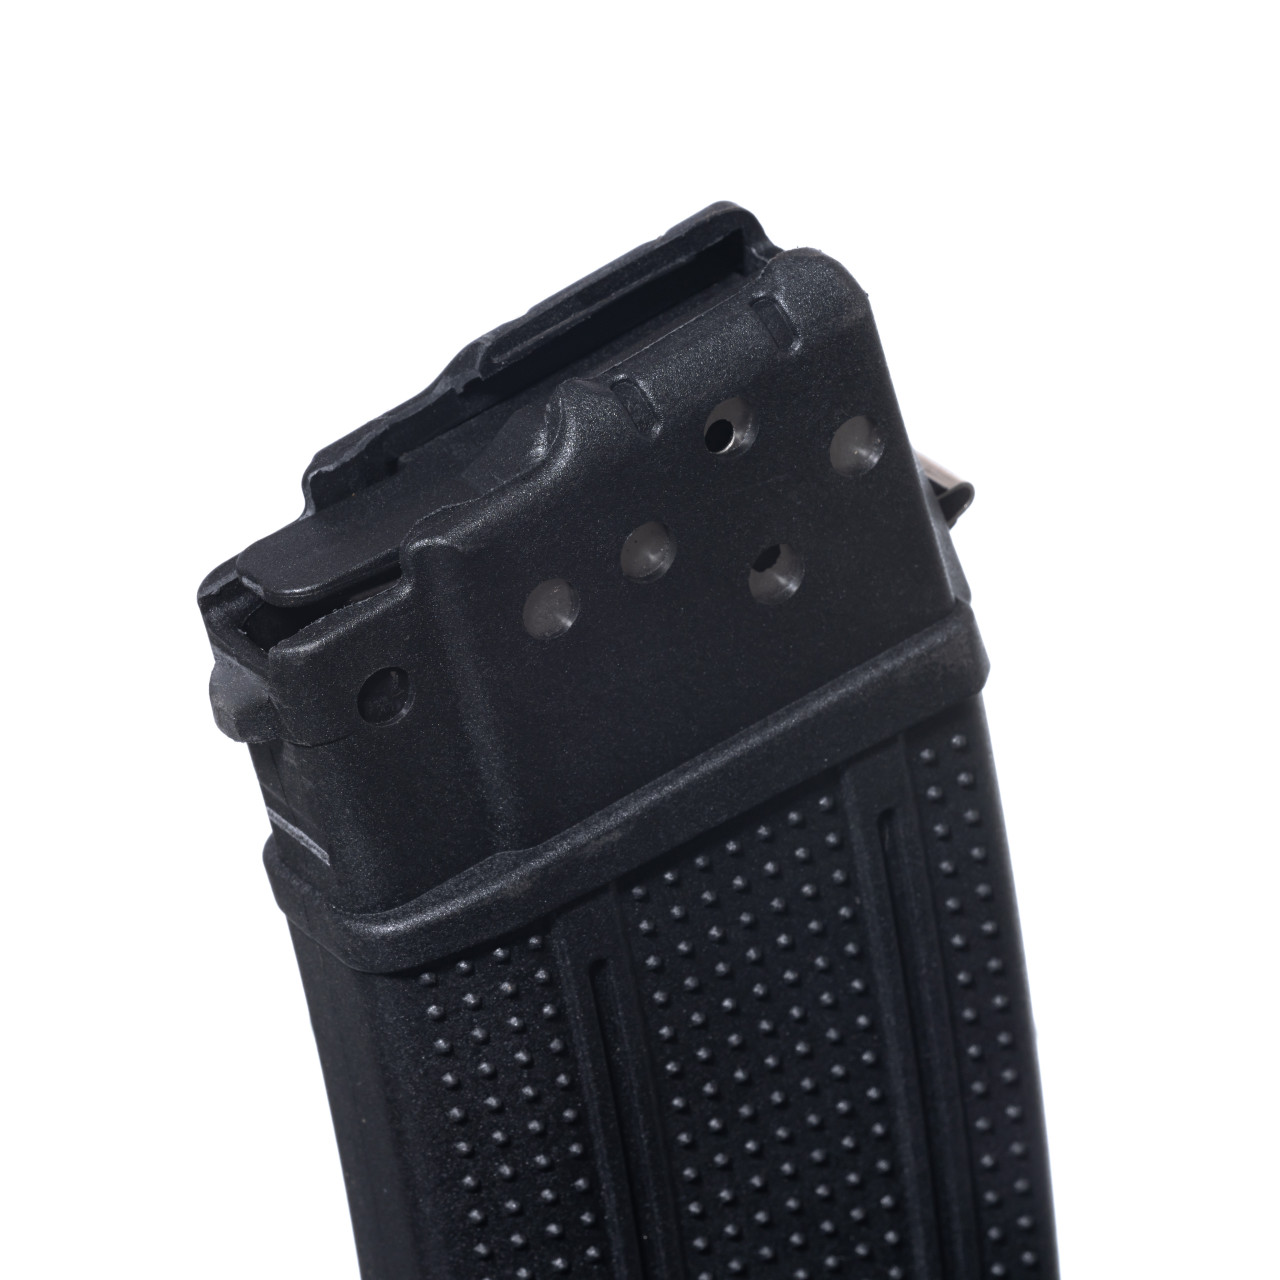 AK-223 5.56mm (30) Rd - Steel Lined Black Polymer